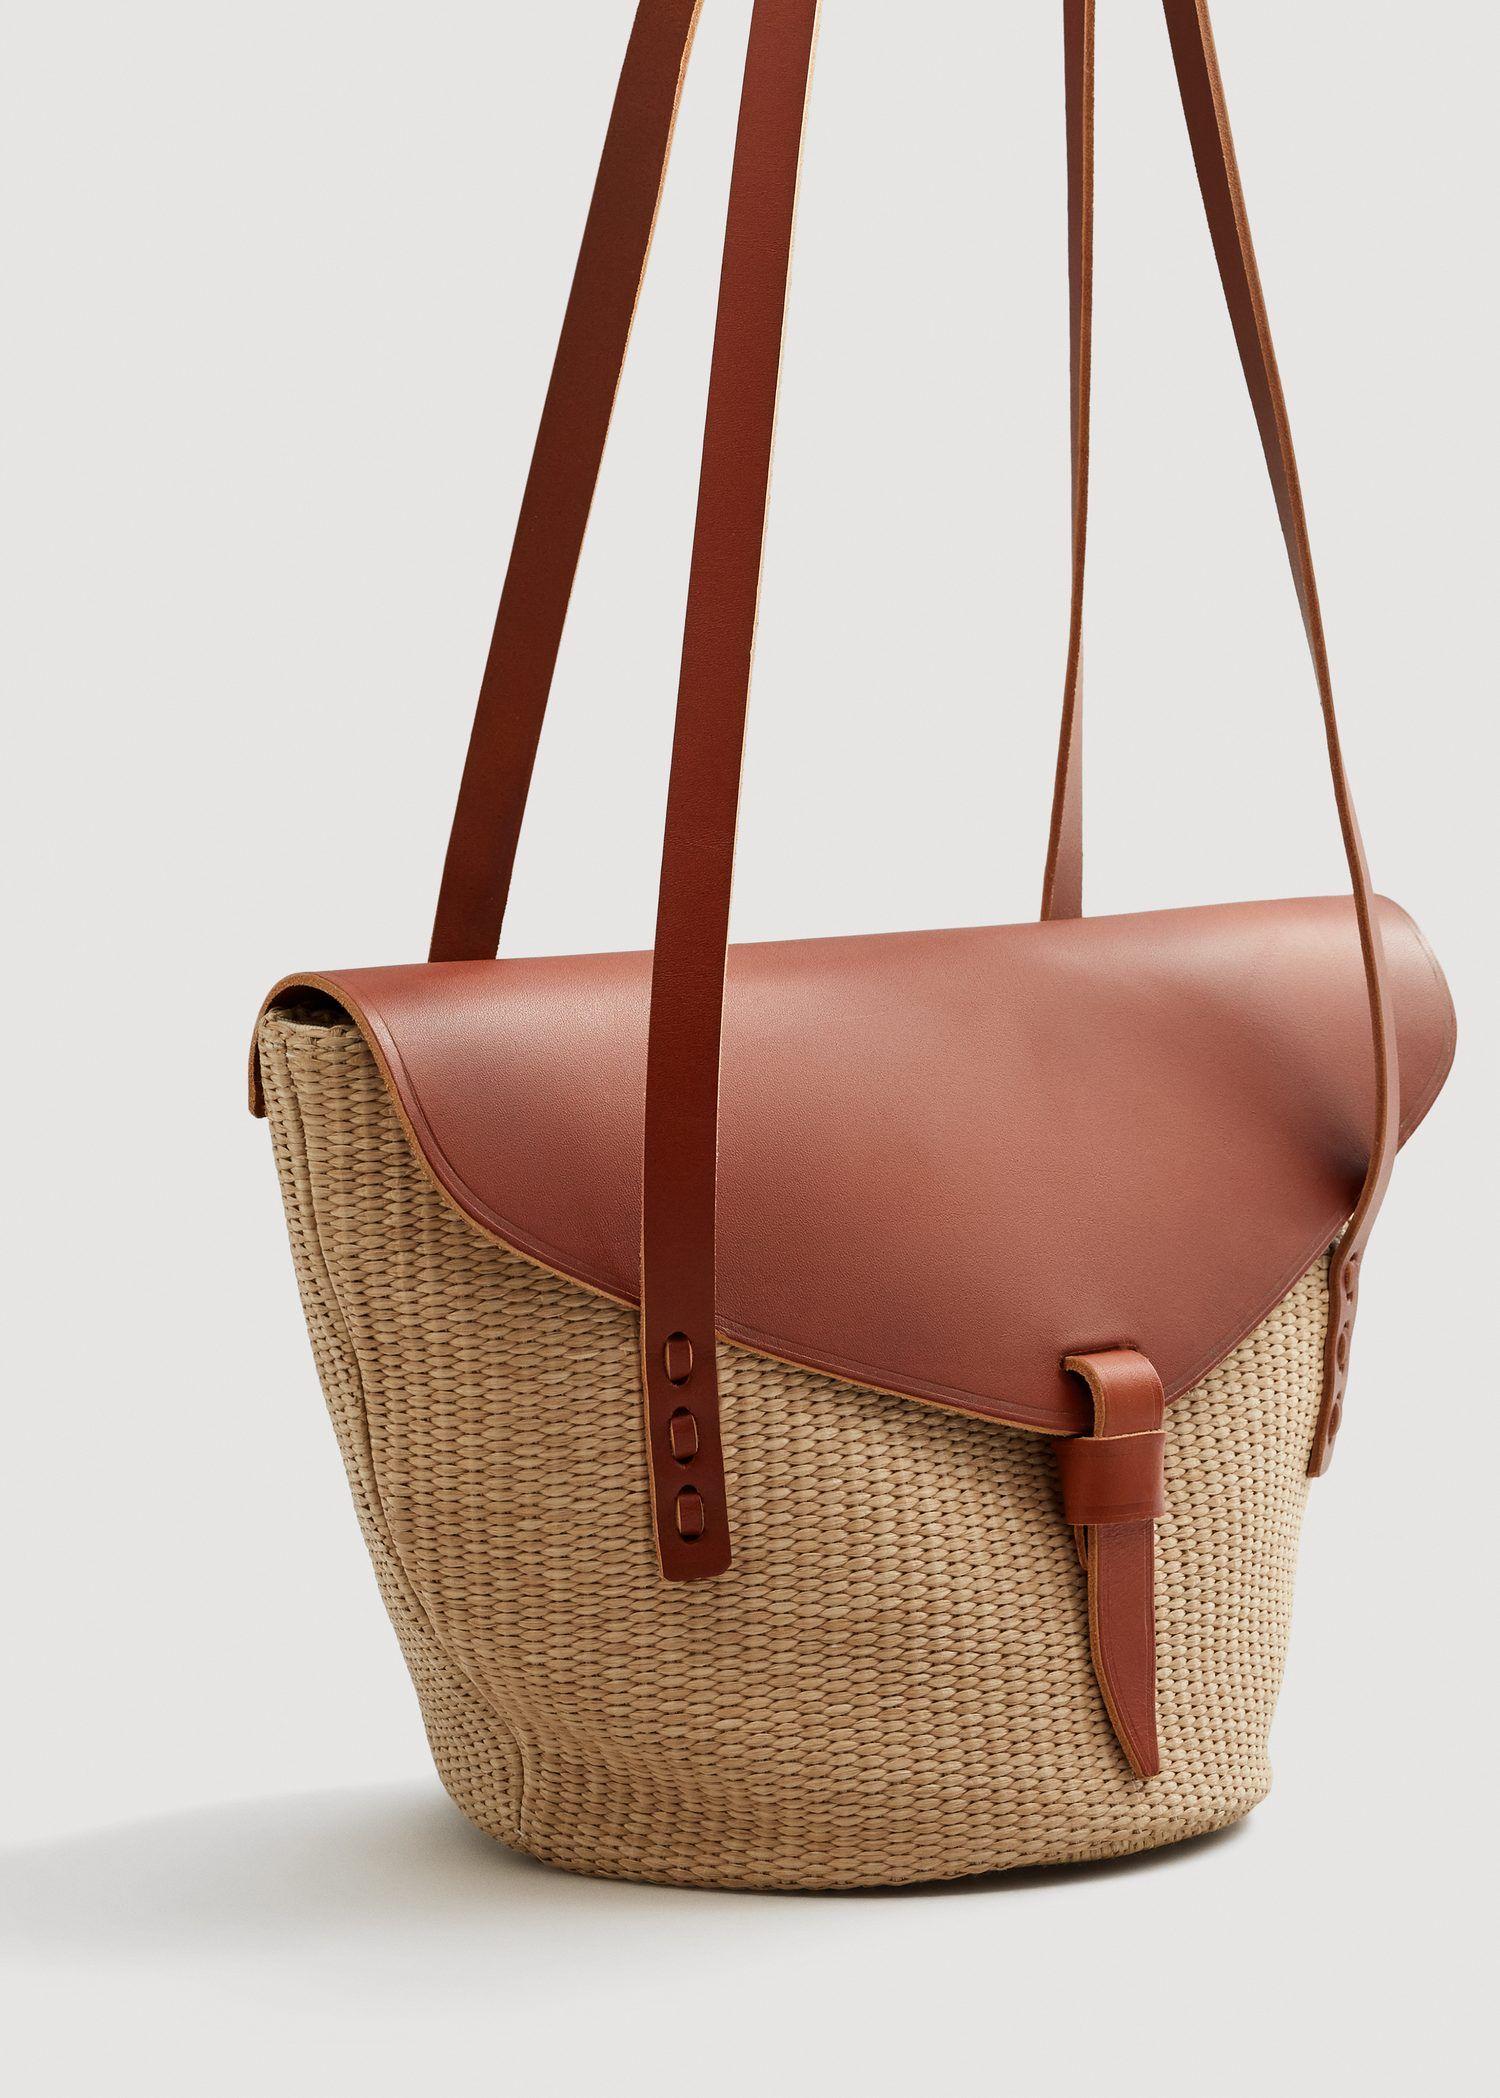 90fd7a20a Bolso rafia solapa piel - Mujer en 2019 | Bags and clutches | Bolso ...